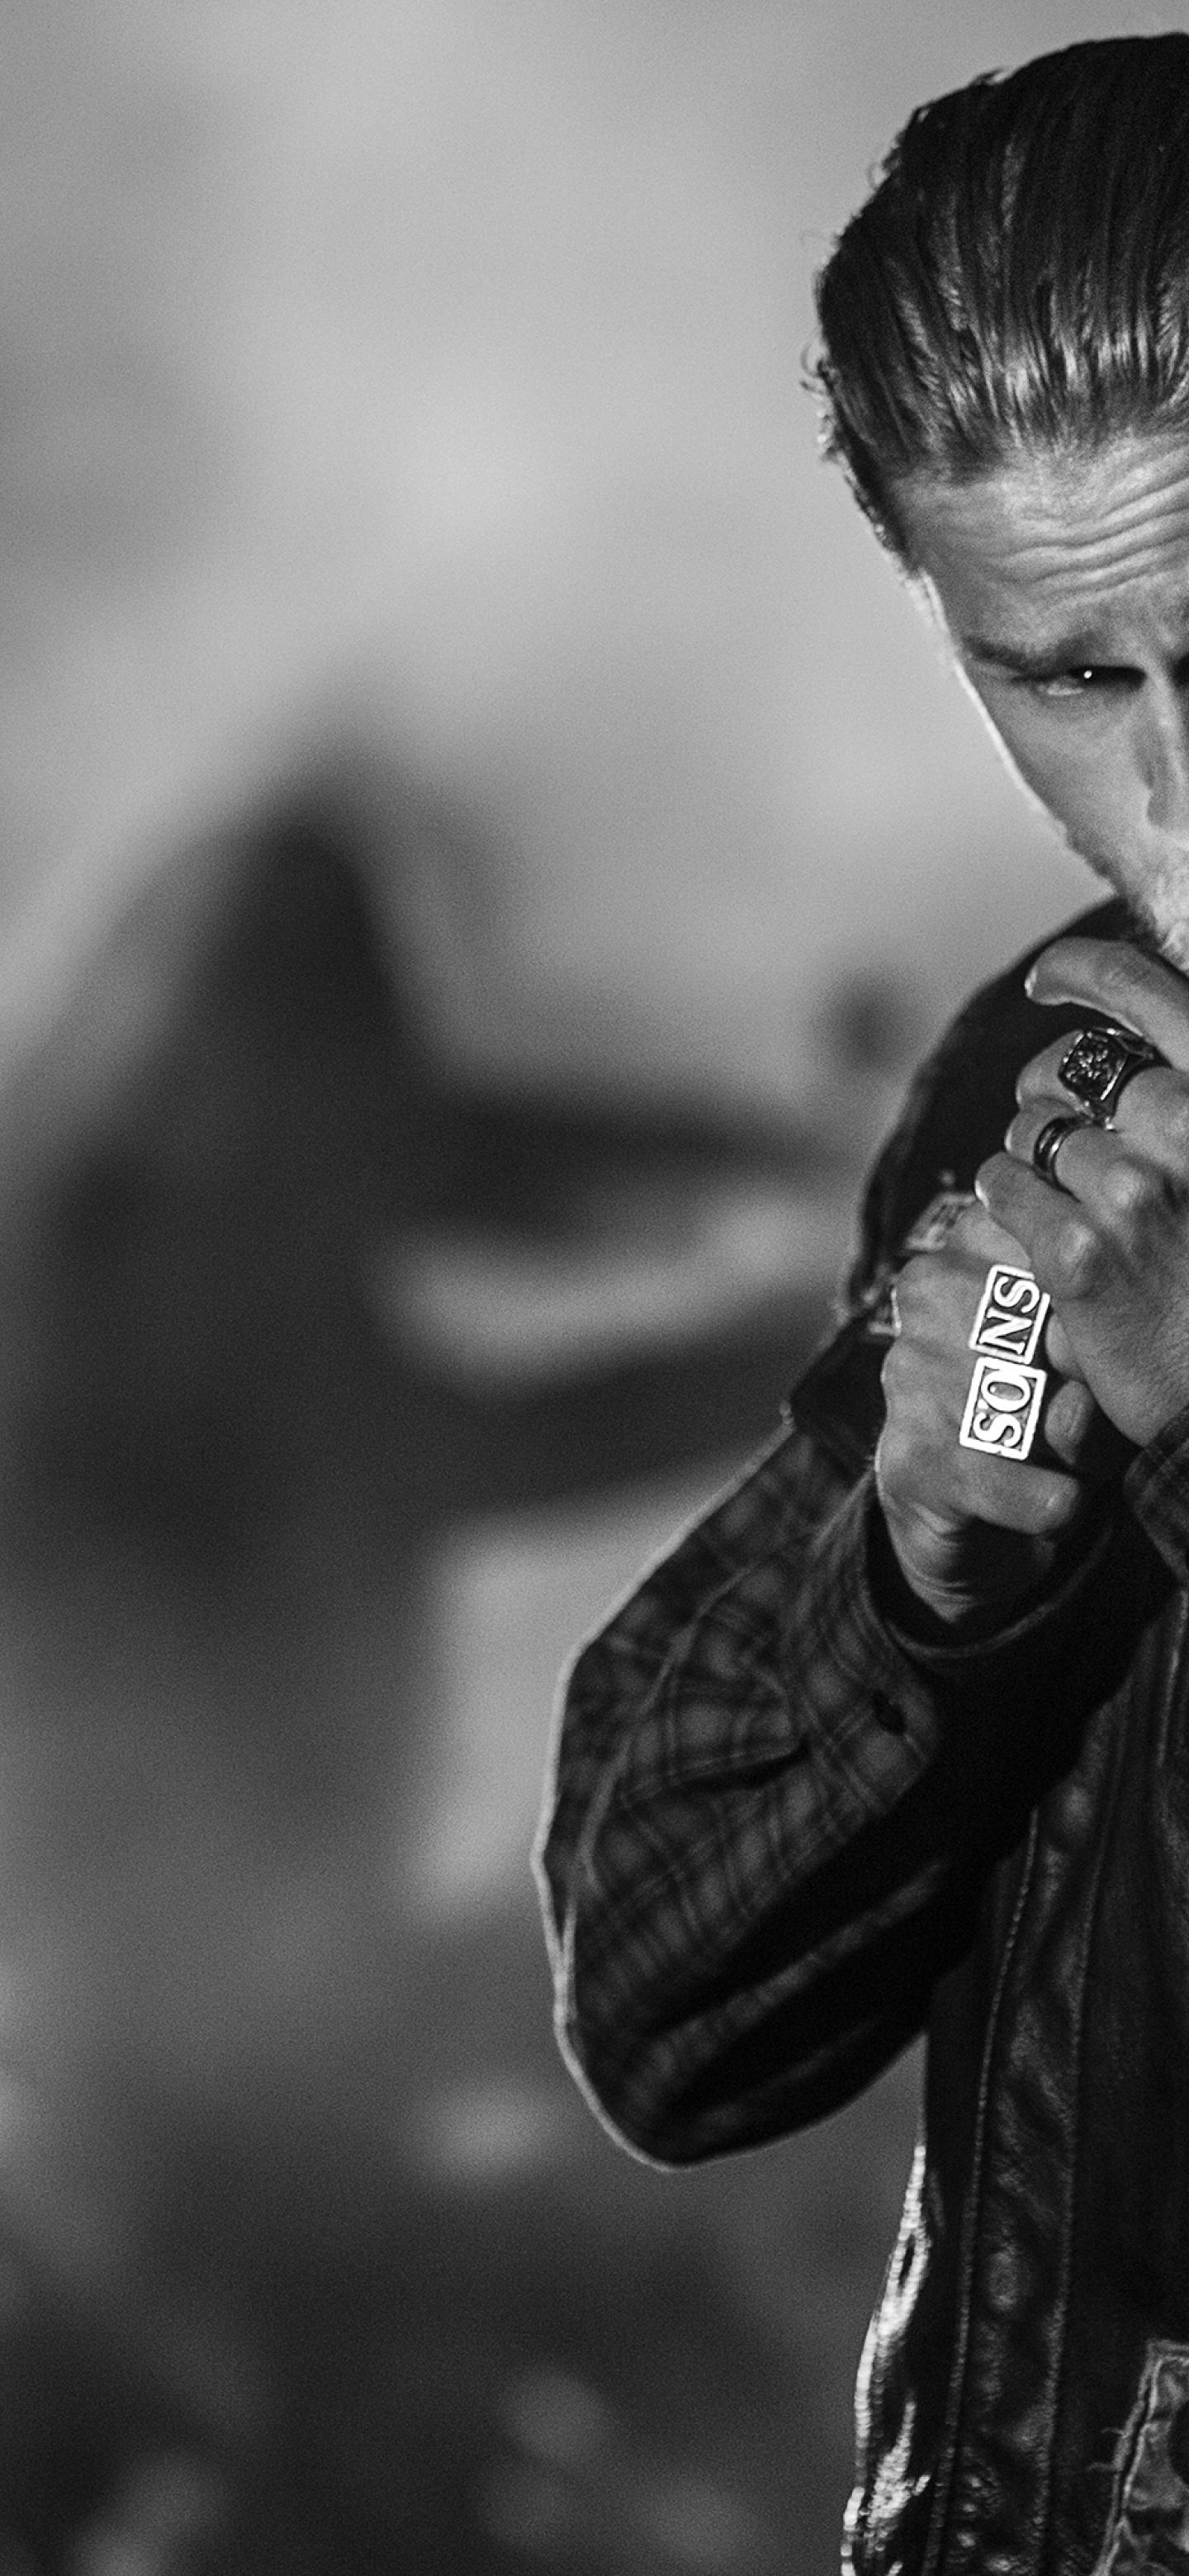 1440x3120 Sons Of Anarchy Jax Teller Charlie Hunnam 1440x3120